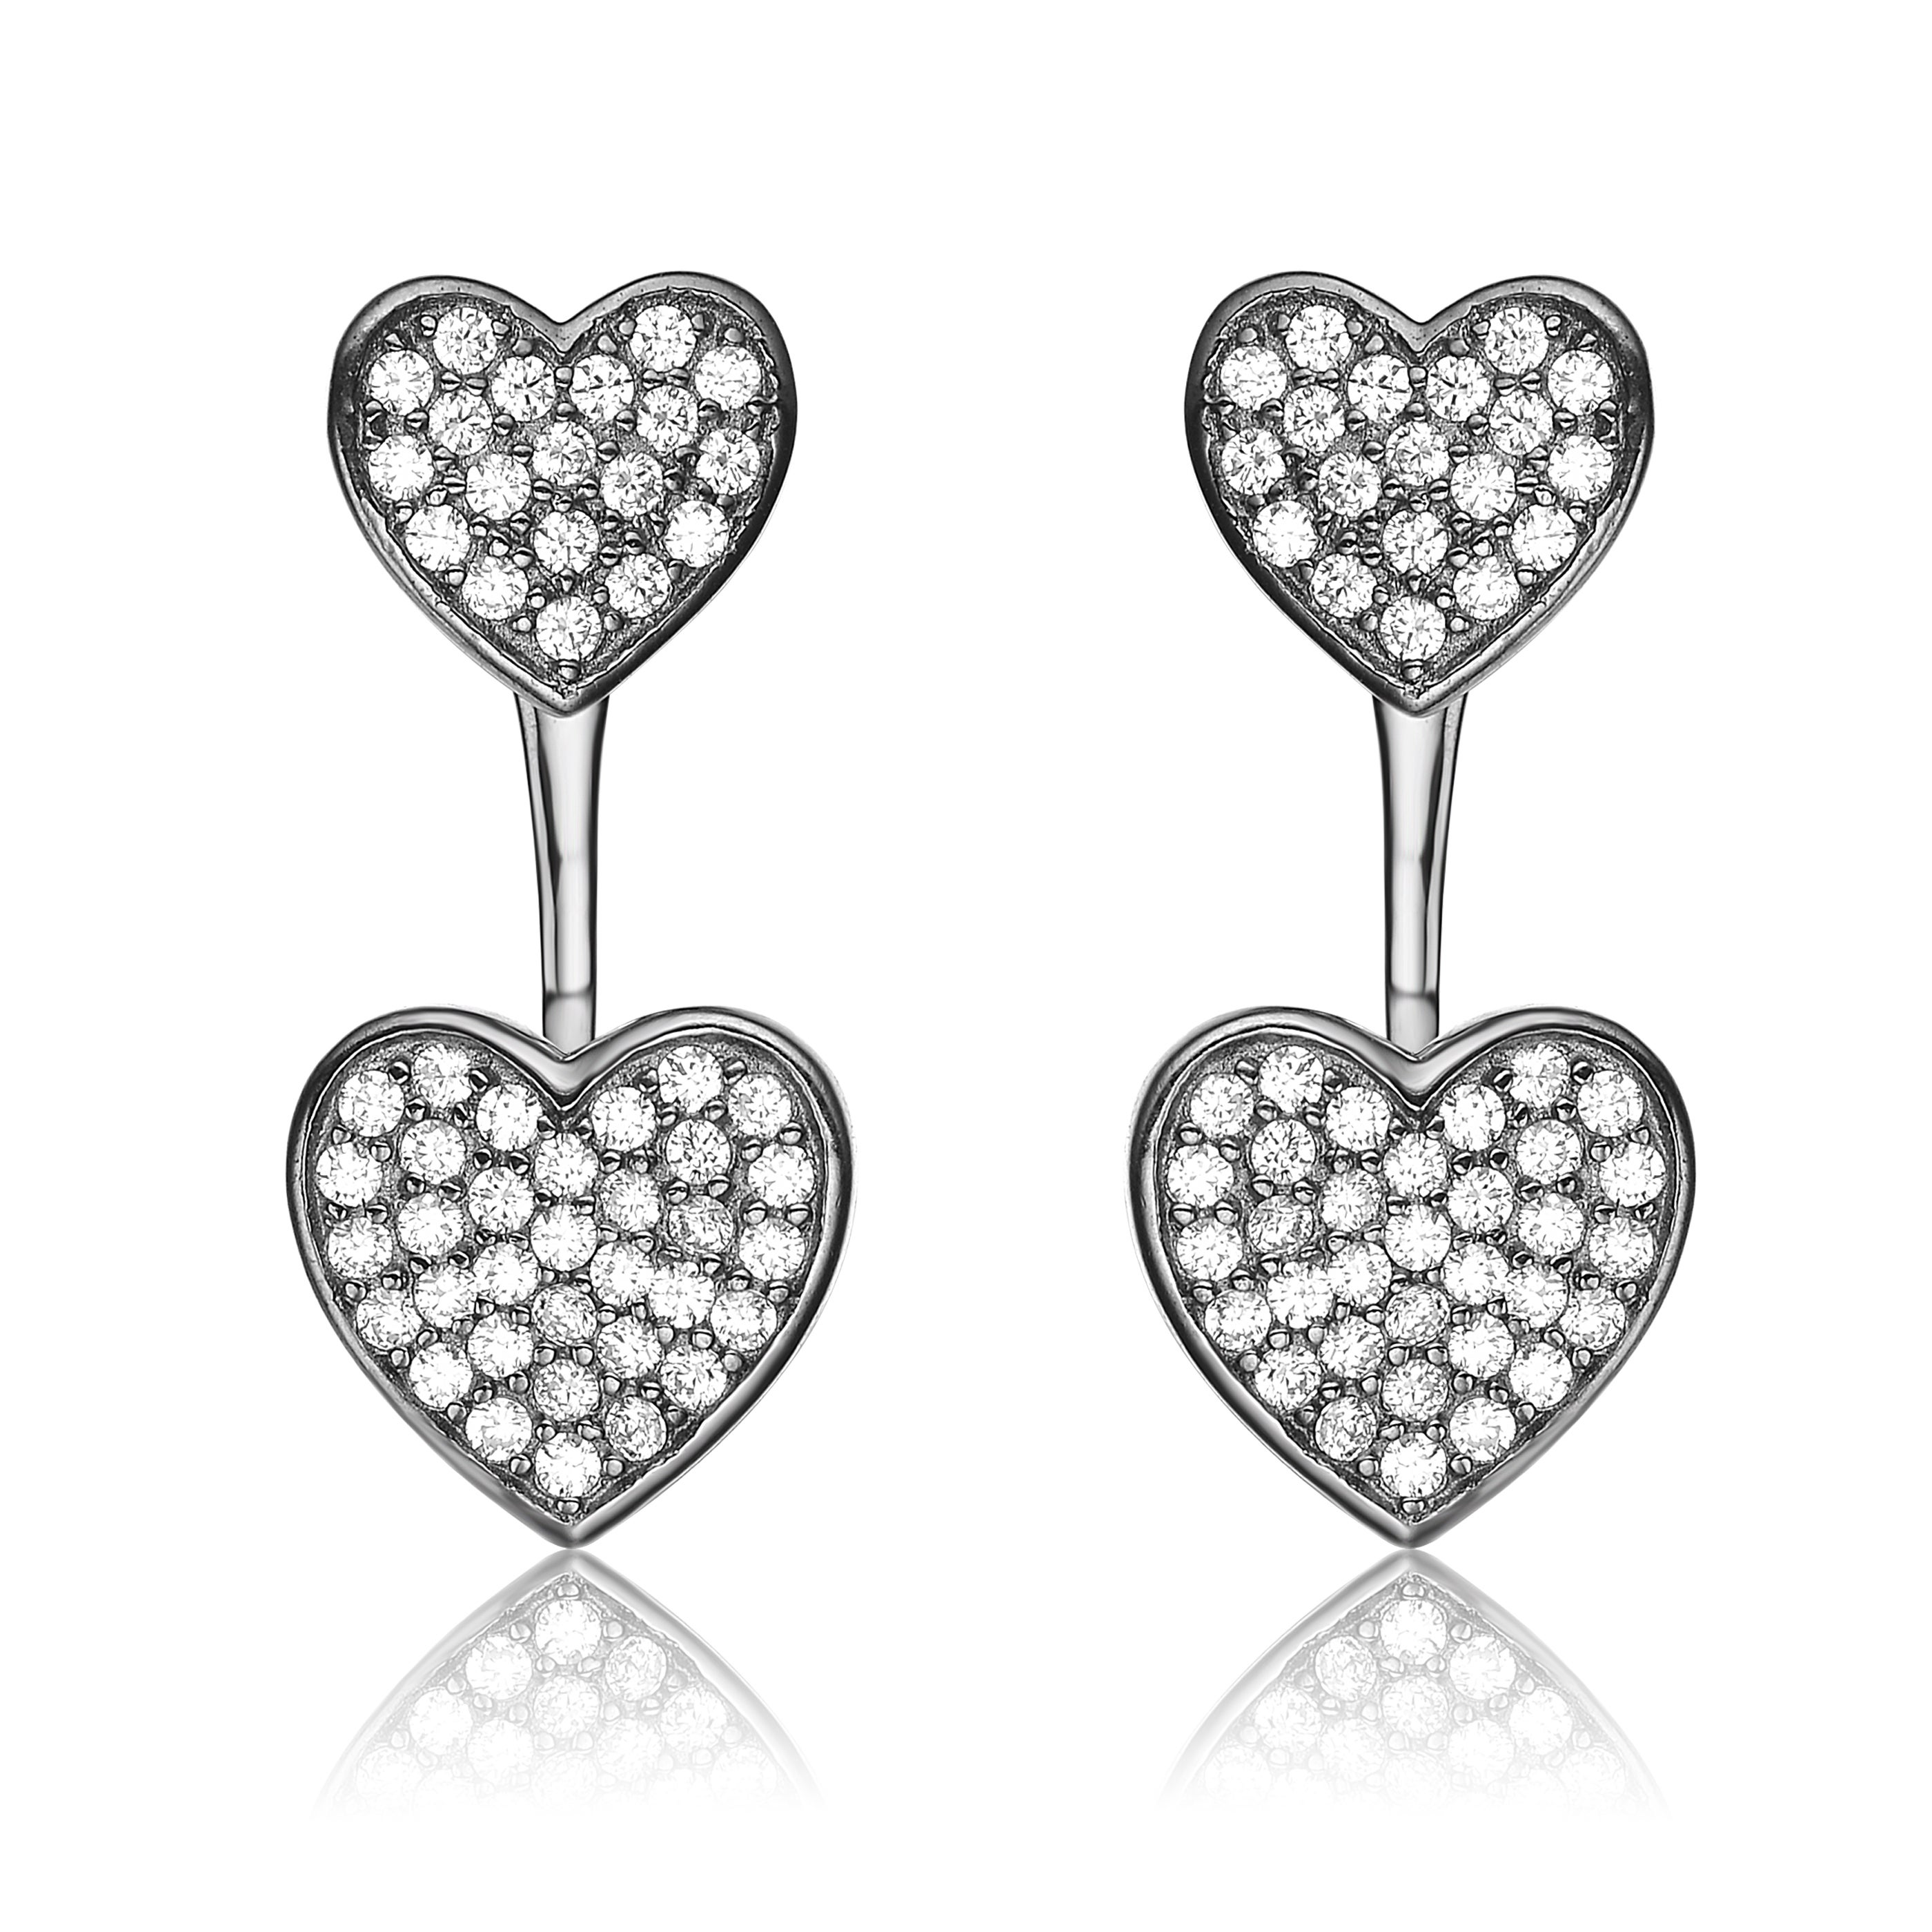 Shop Collette Z Sterling Silver Cubic Zirconia Double Heart Jacket